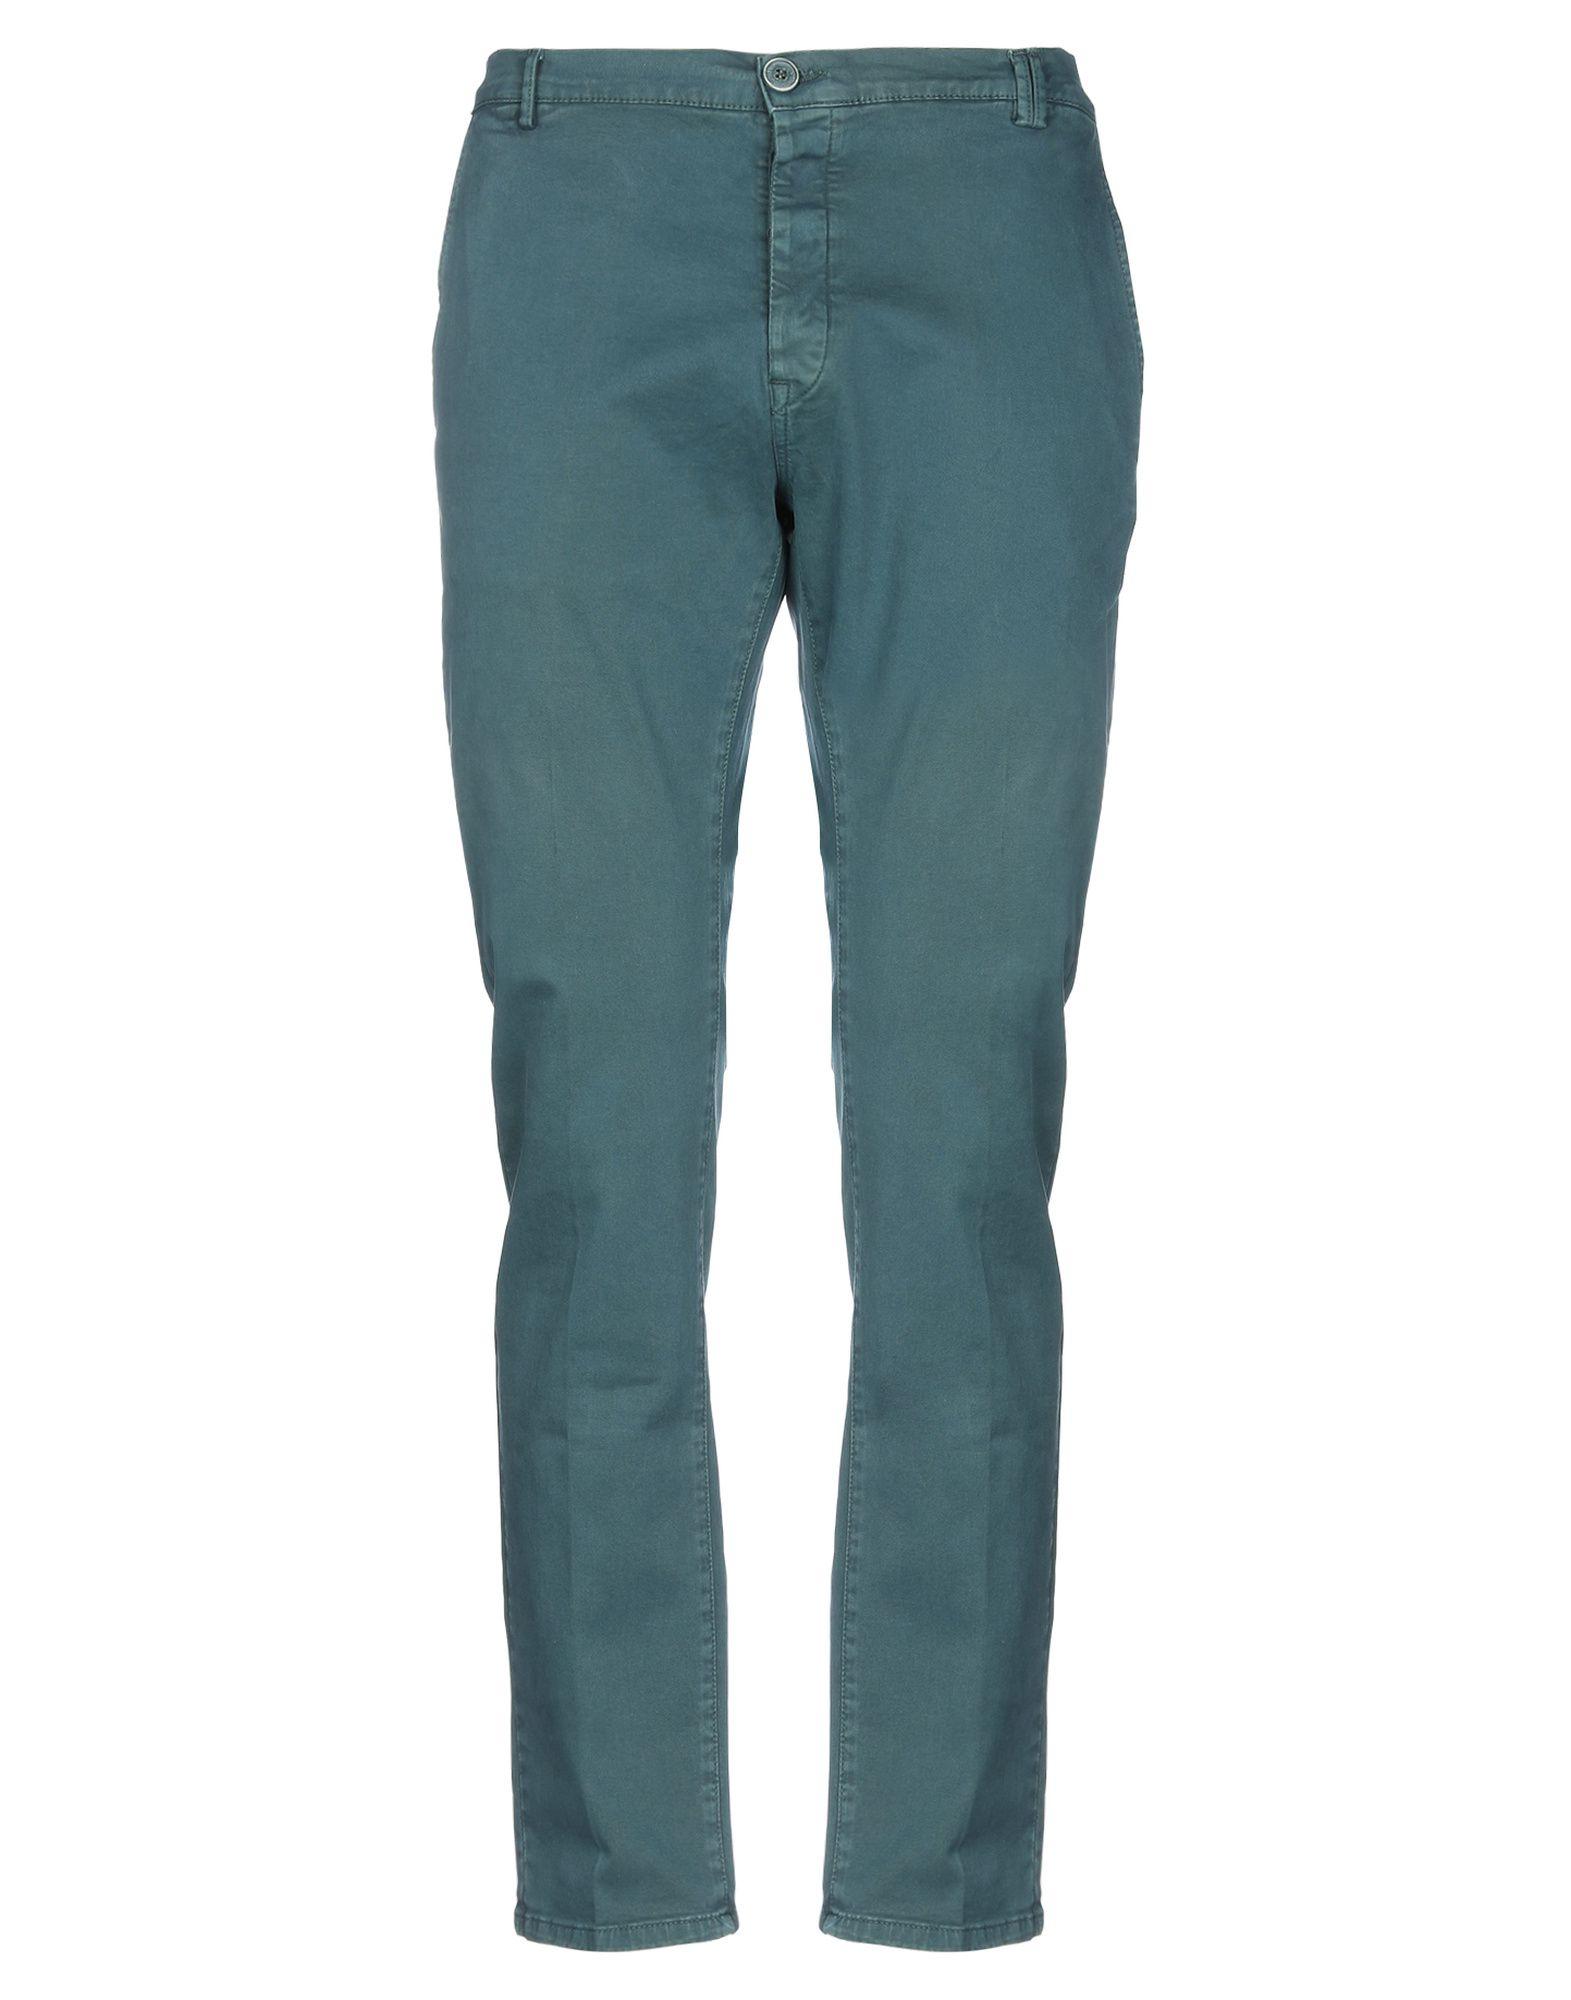 AN UPDATE Повседневные брюки